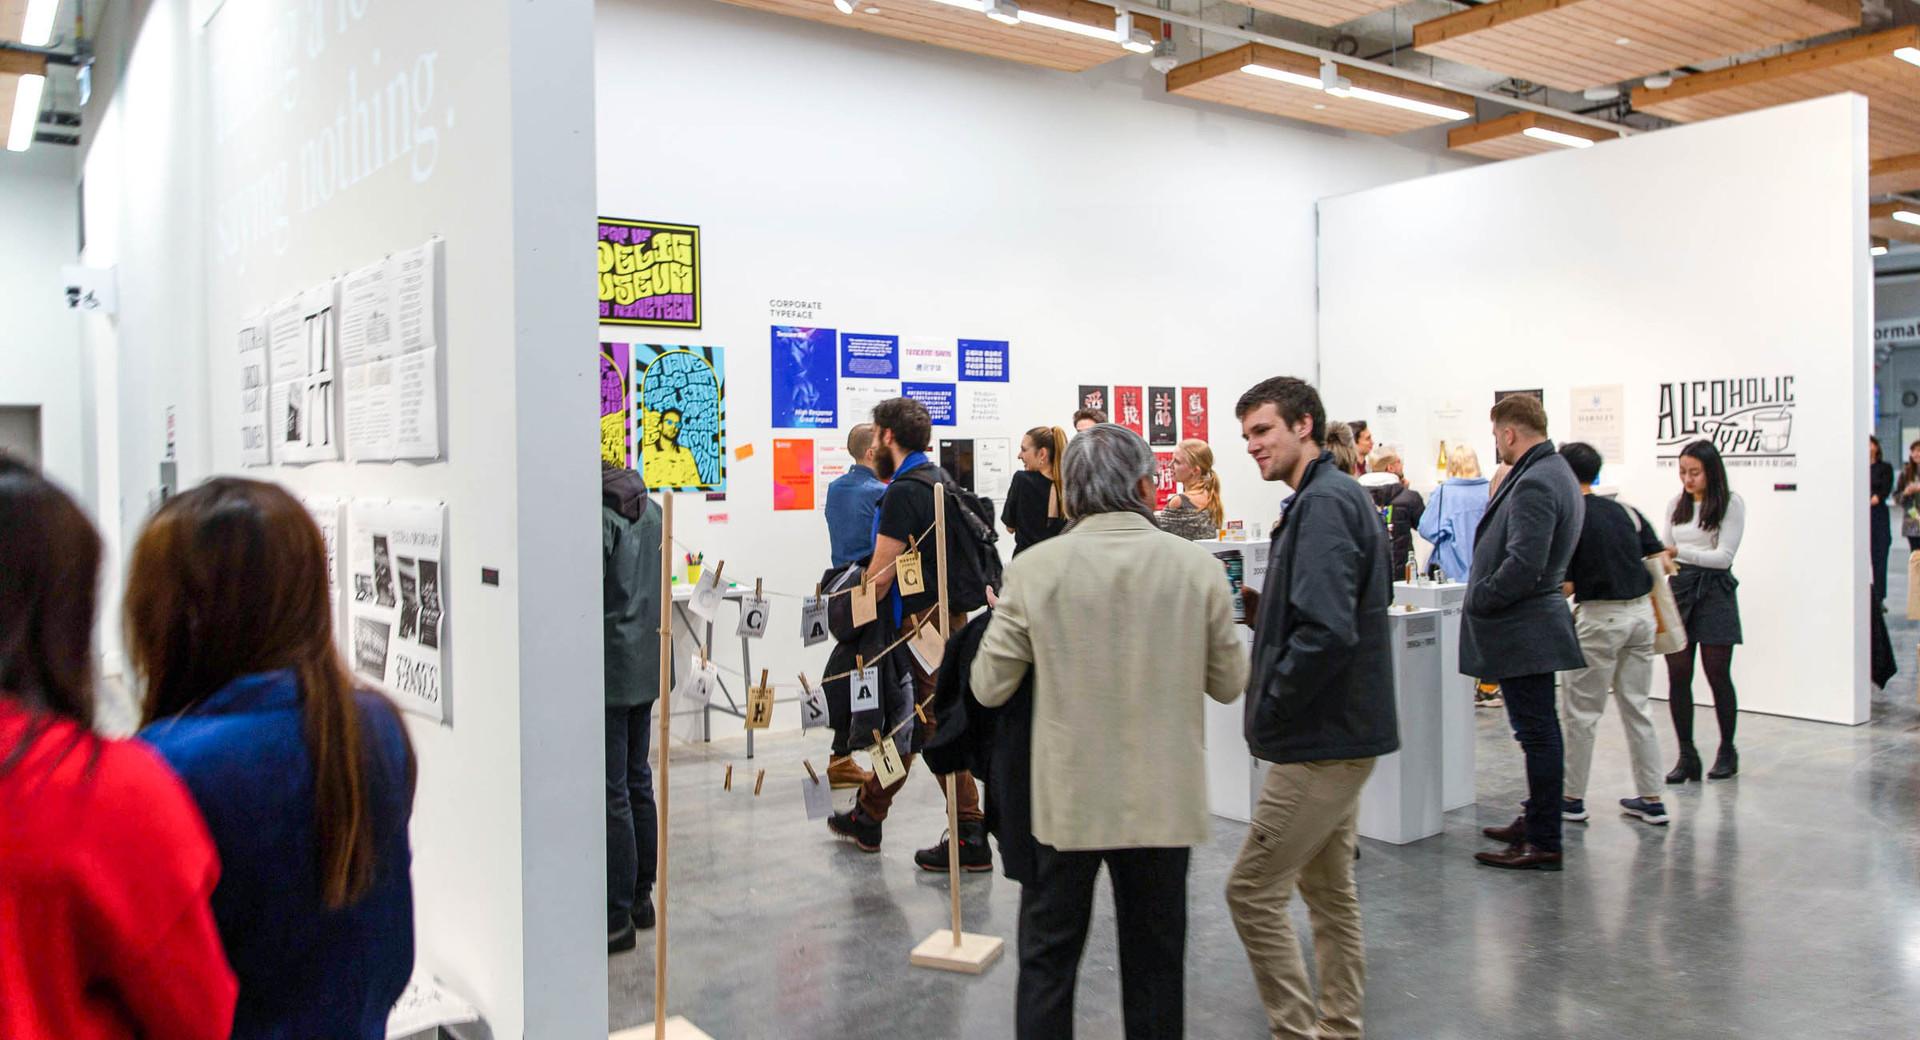 triet-pham-pop-up-type-museum-opening-ni